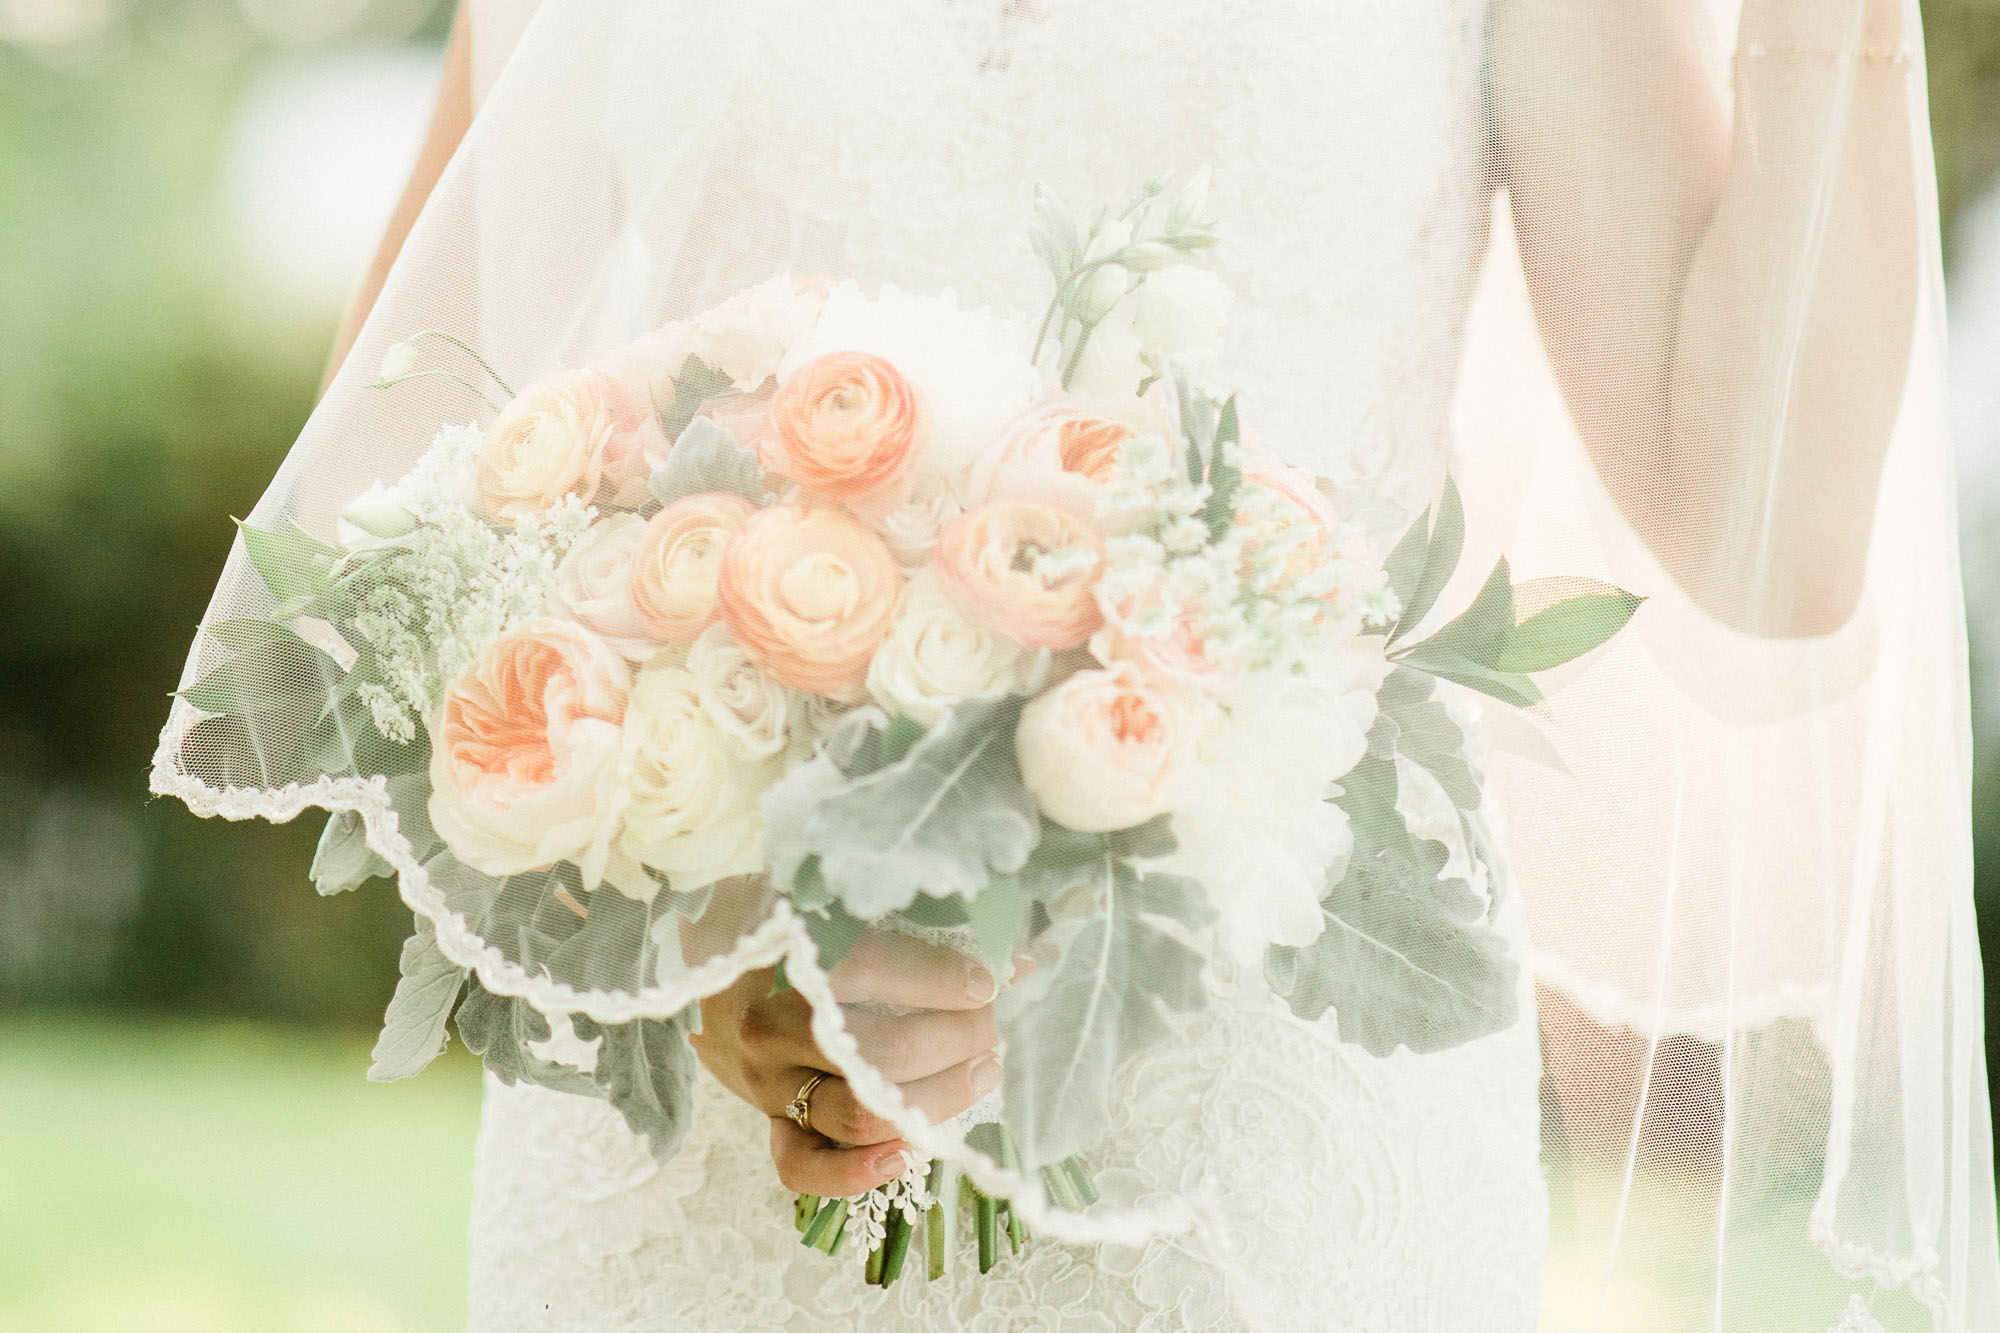 Allenberry-resort-historic-pennsylvania-wedding-22370.jpg